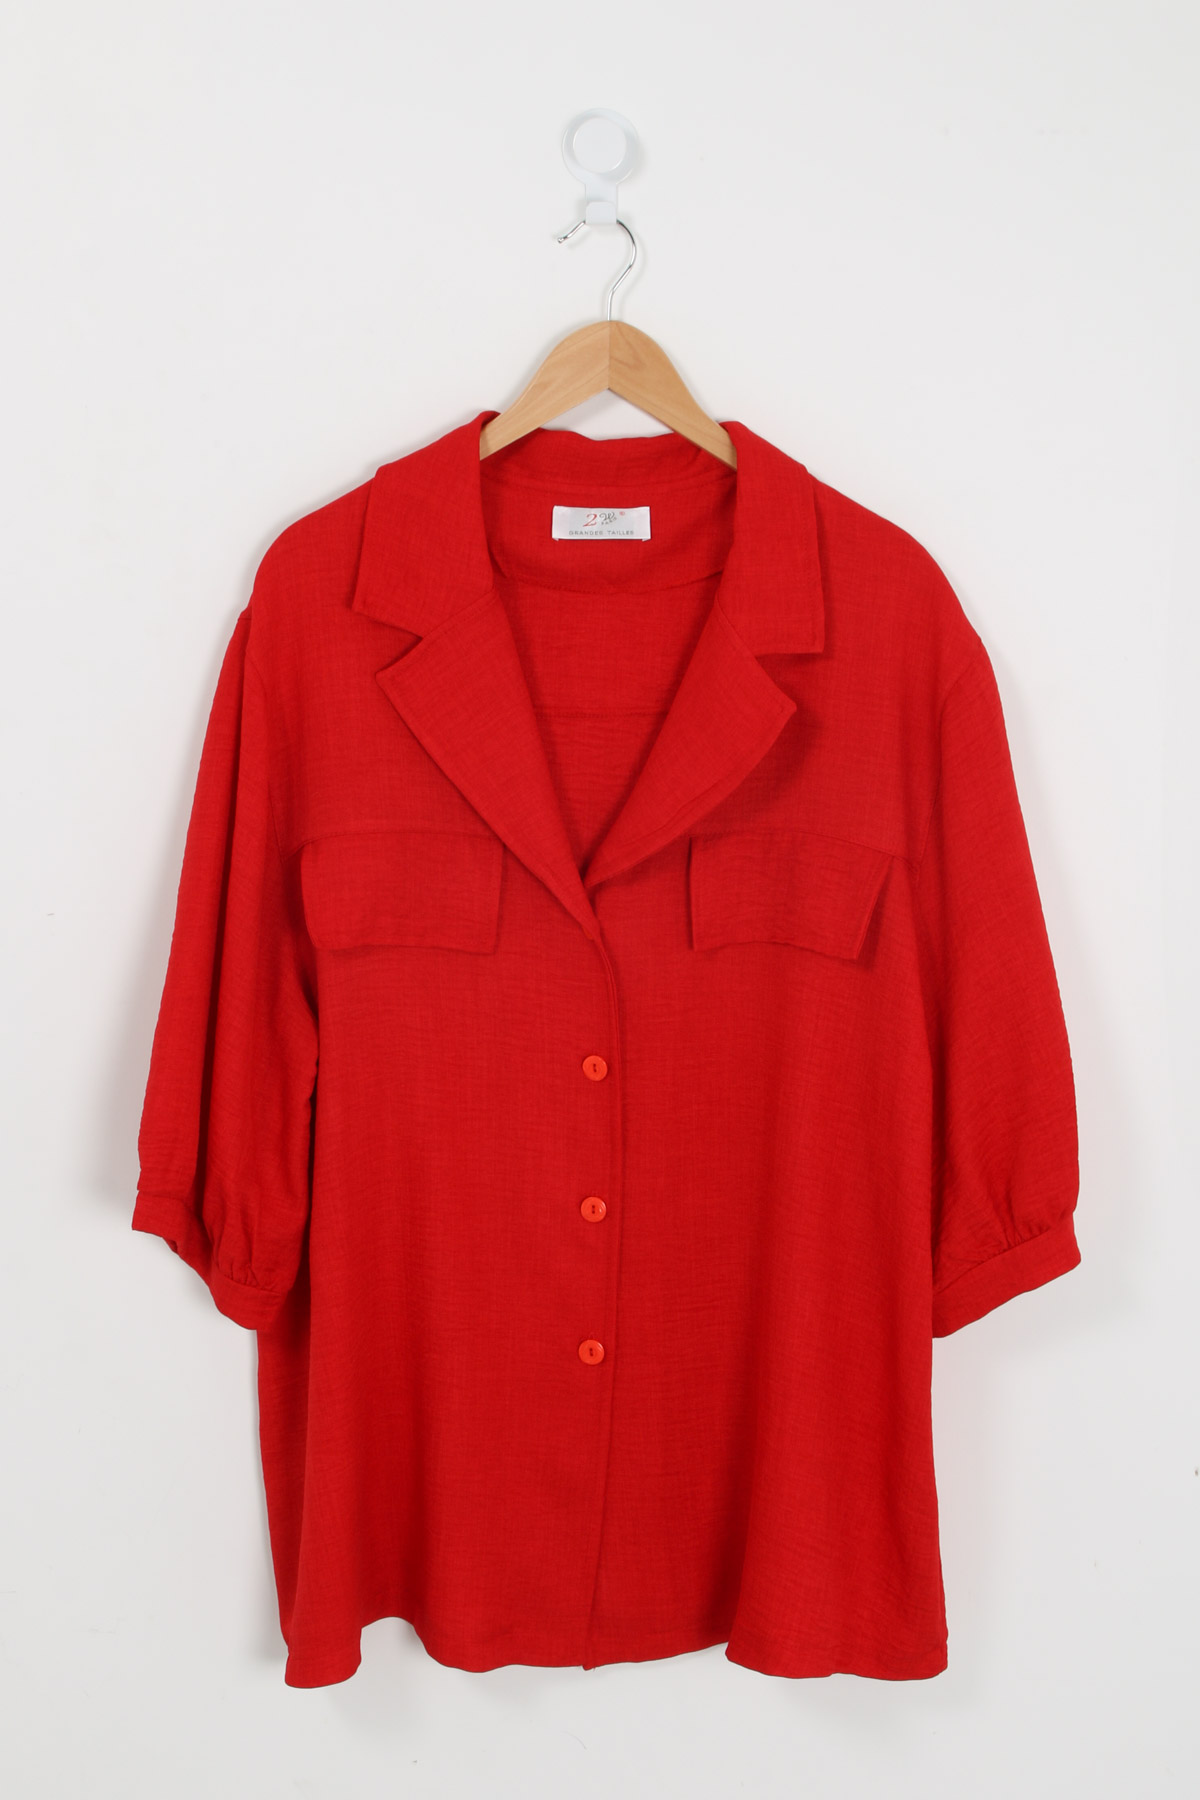 Chemise grande taille femme C1321 rouge 2W PARIS